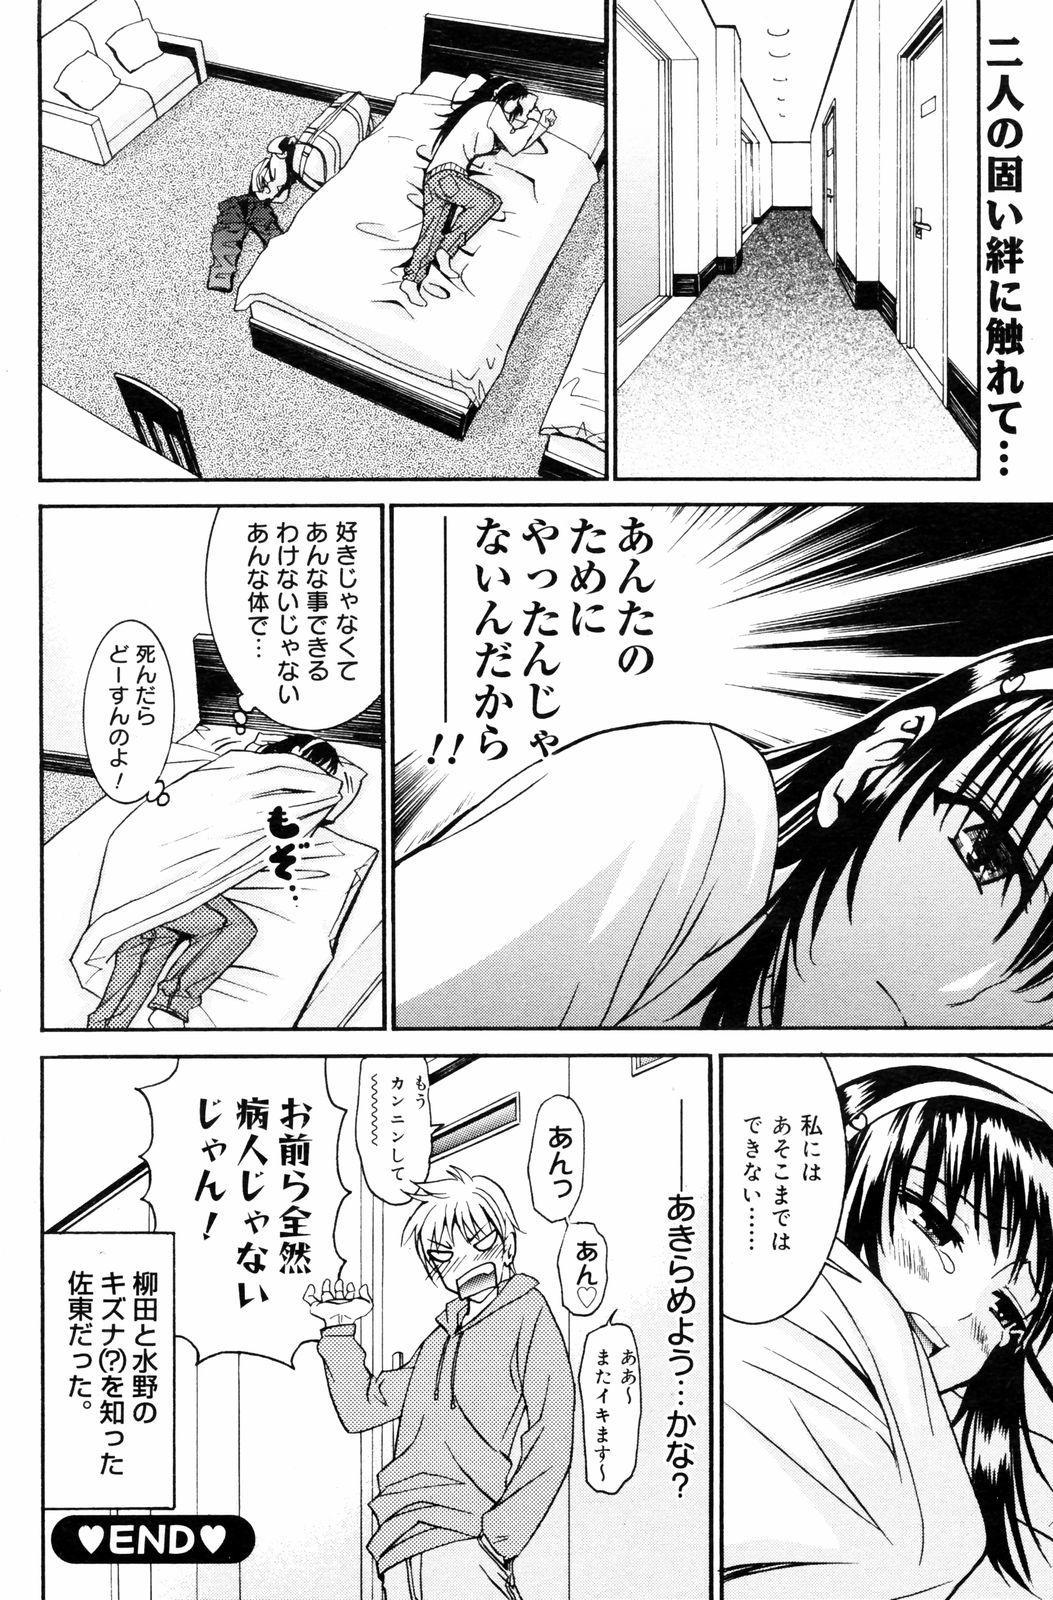 Manga Bangaichi 2008-03 153